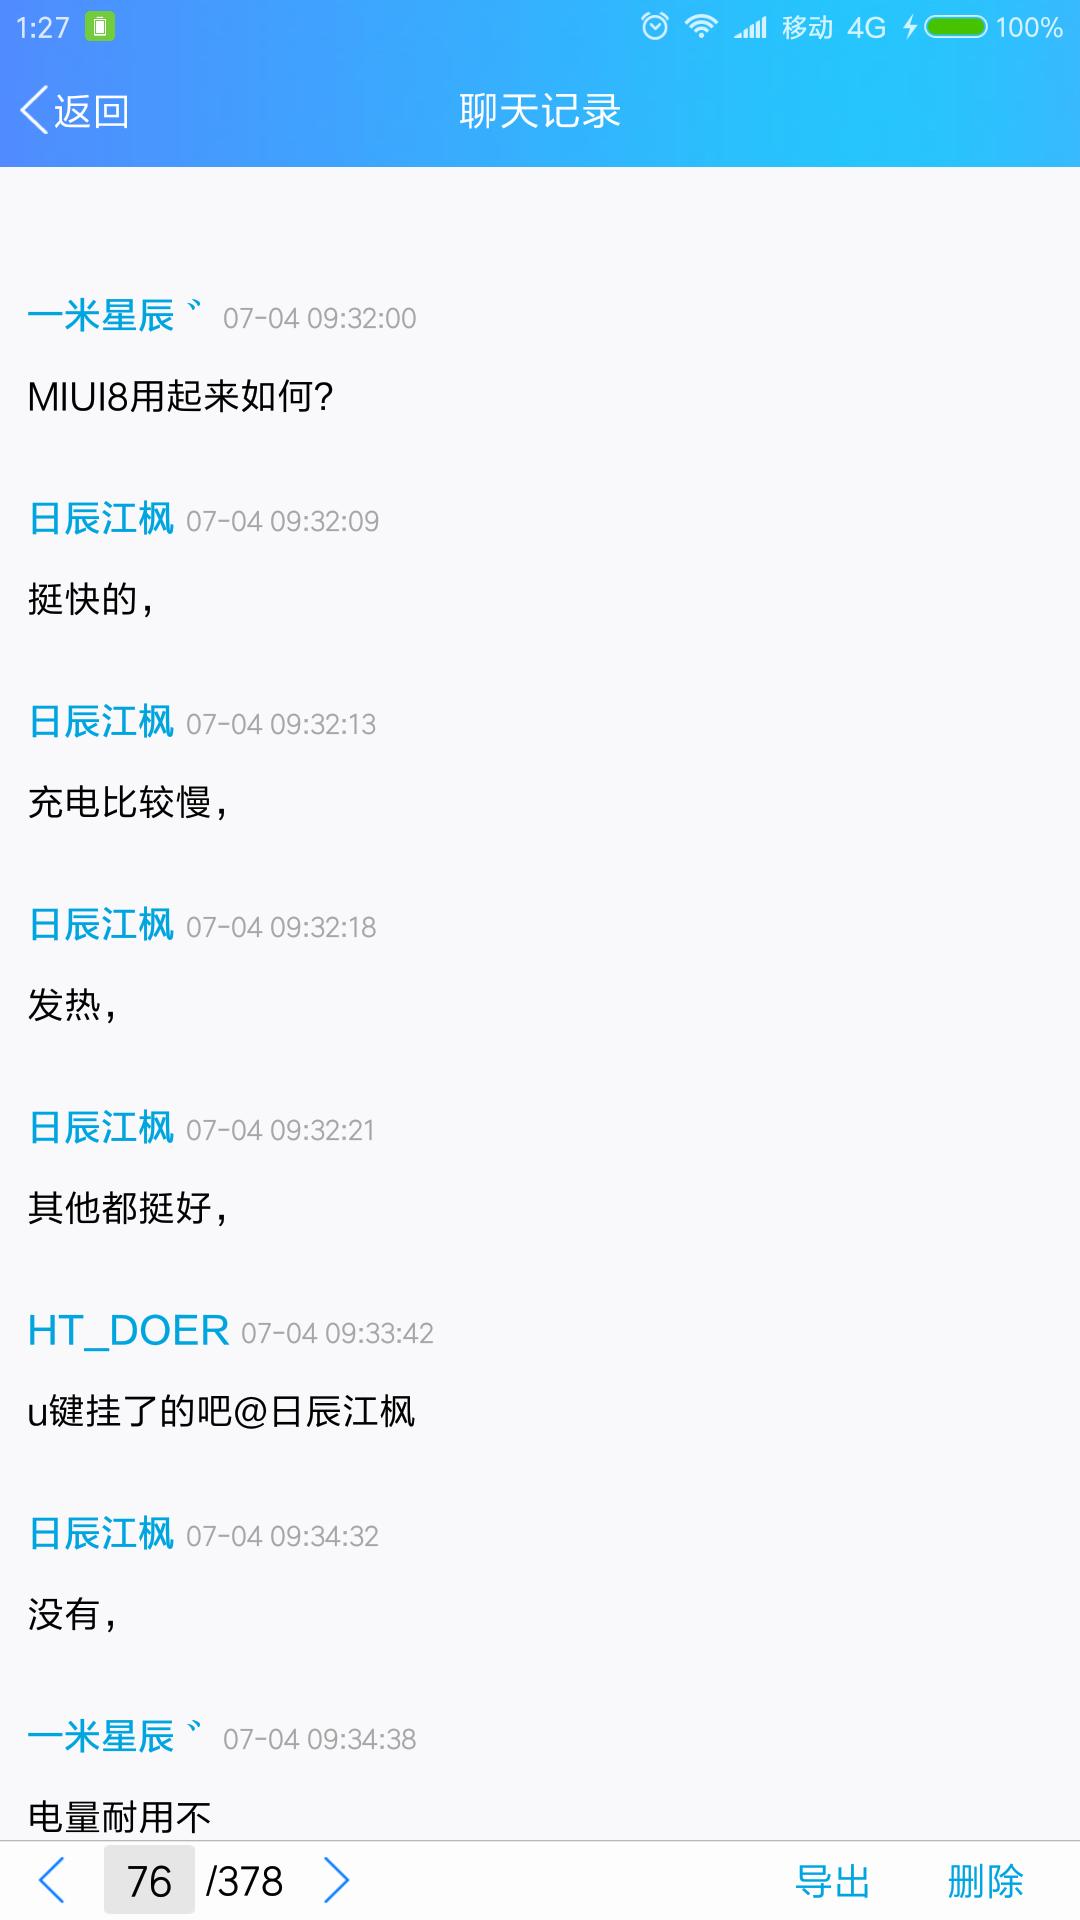 Screenshot_2017-07-09-01-27-06-344_com.tencent.mobileqq.png